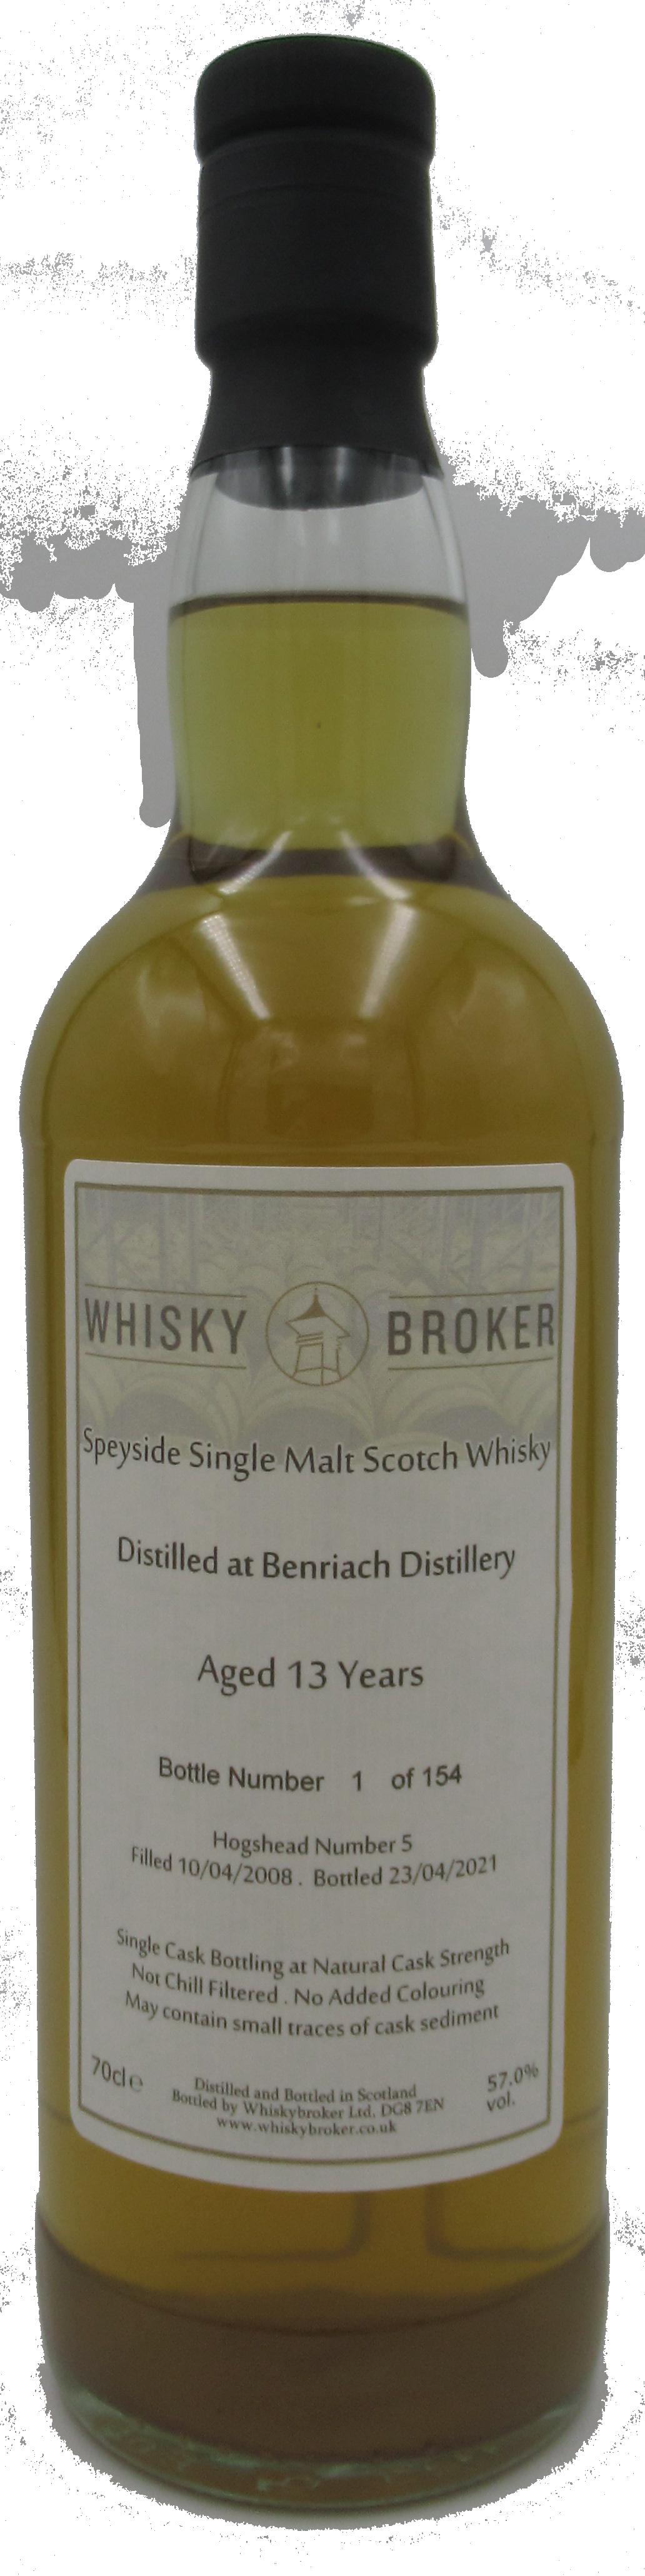 70cl, 13yo Distilled at Benriach Distillery